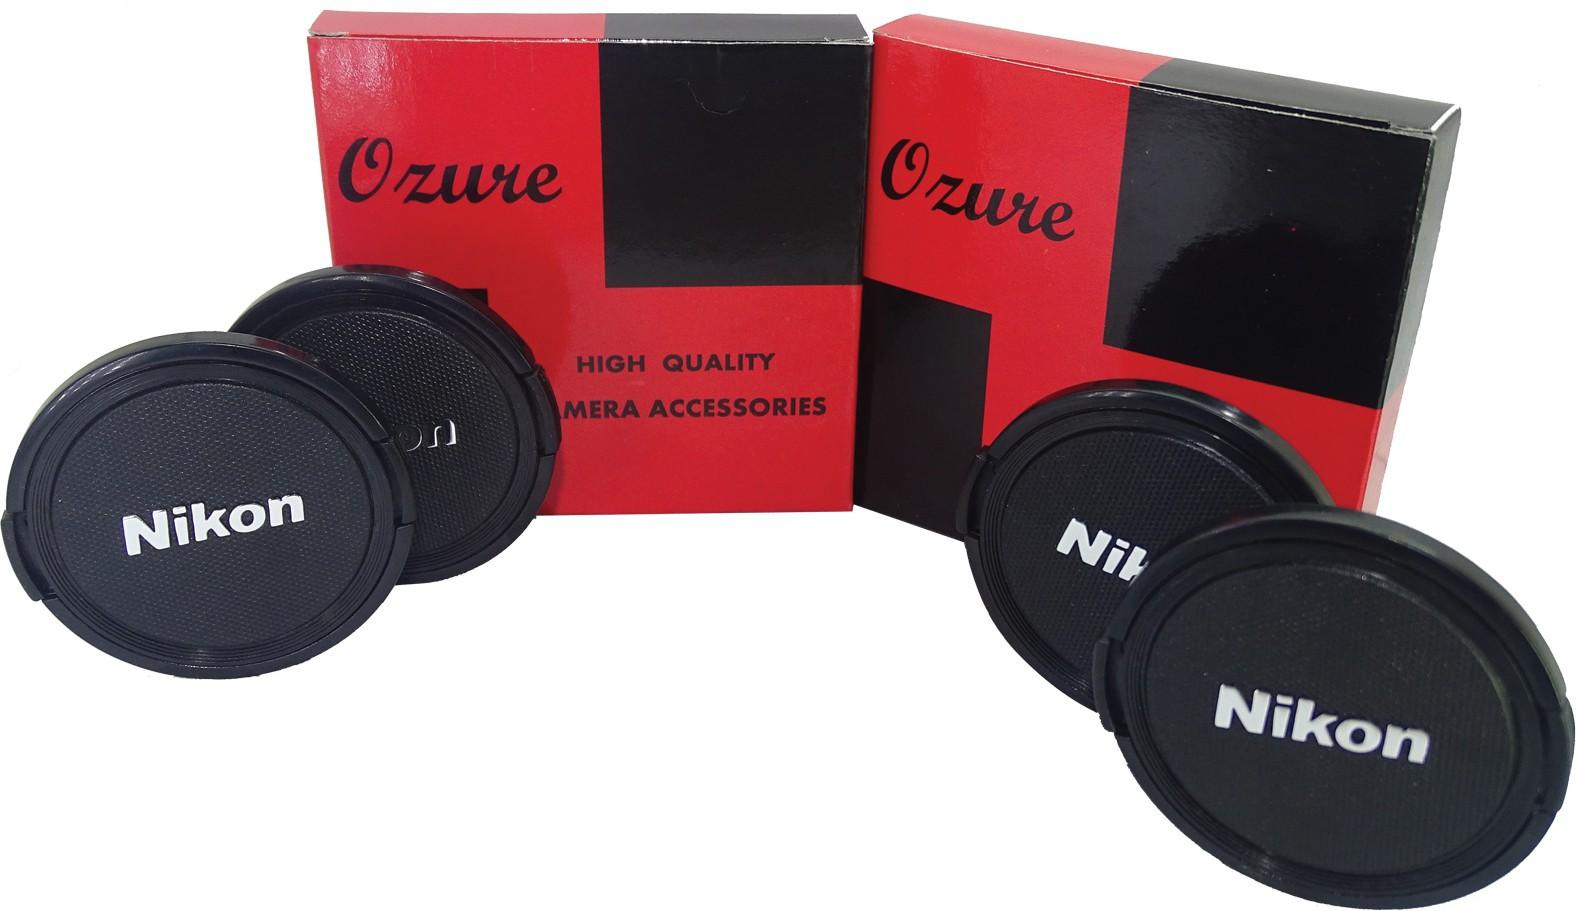 Ozure SECLCN62B  Lens Cap(Black + Silver Embossed, 62 mm)